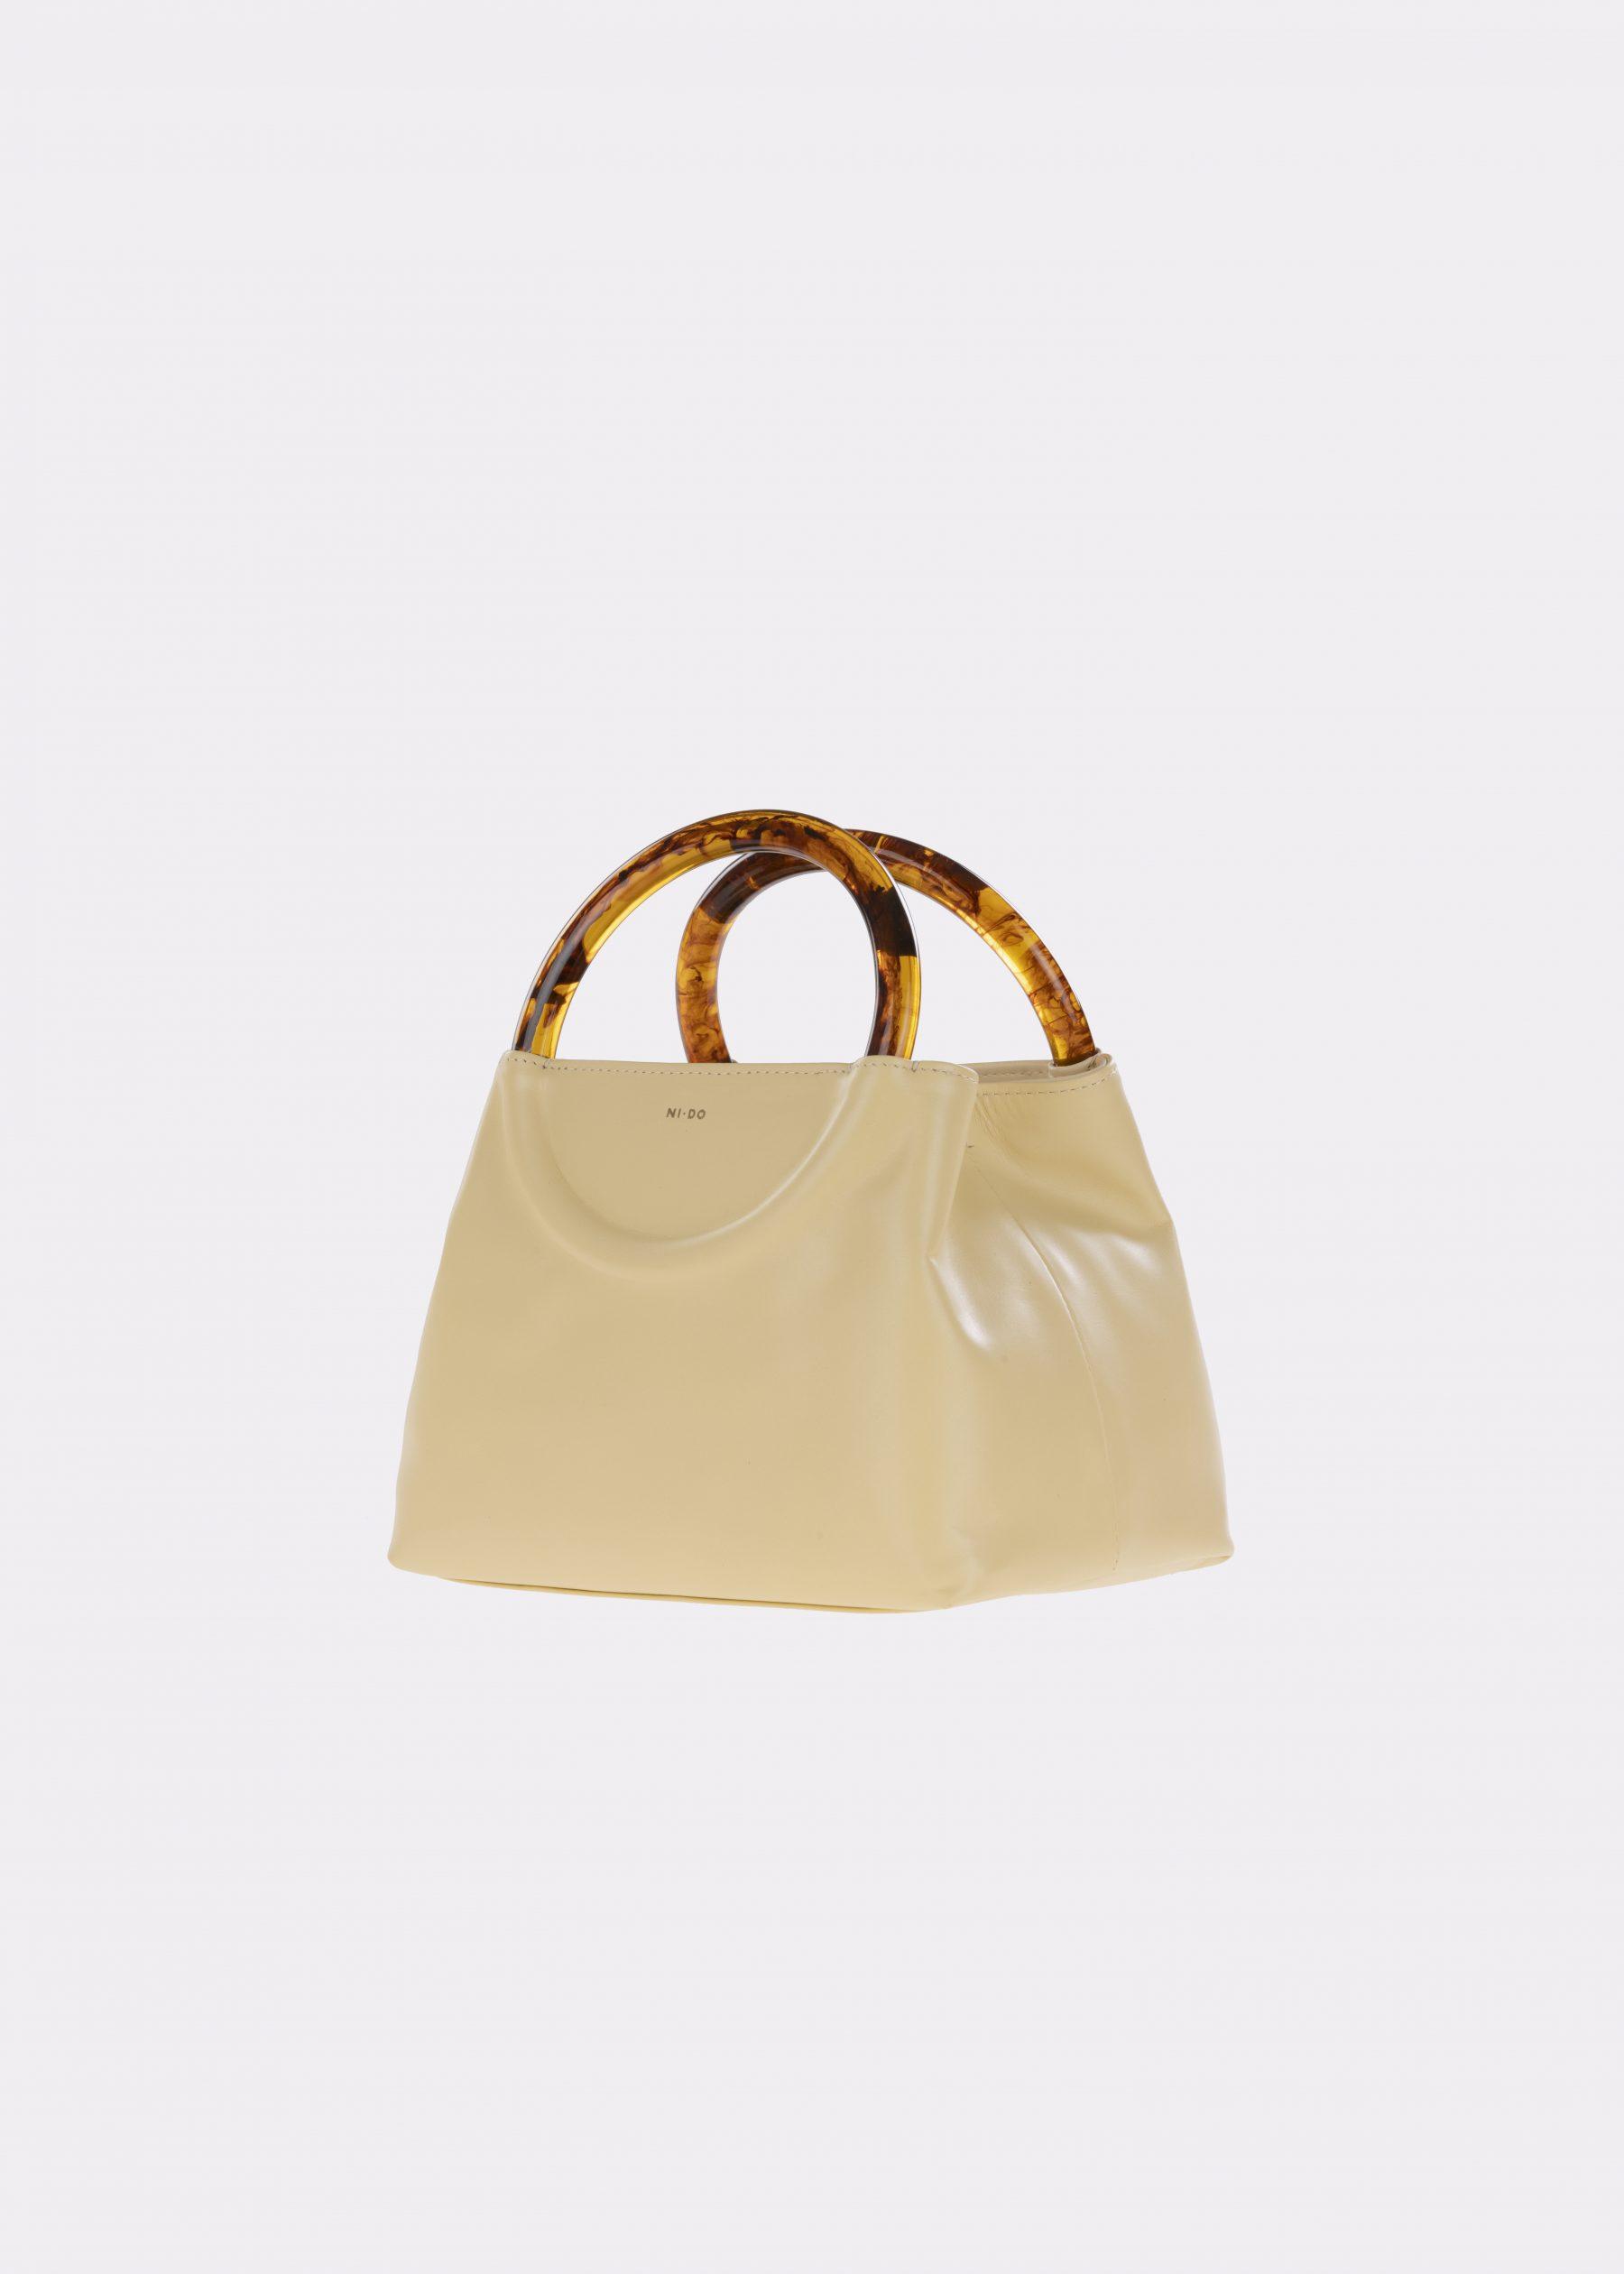 NIDO-Bolla_Mini-bag-lemontart-Amber_side view